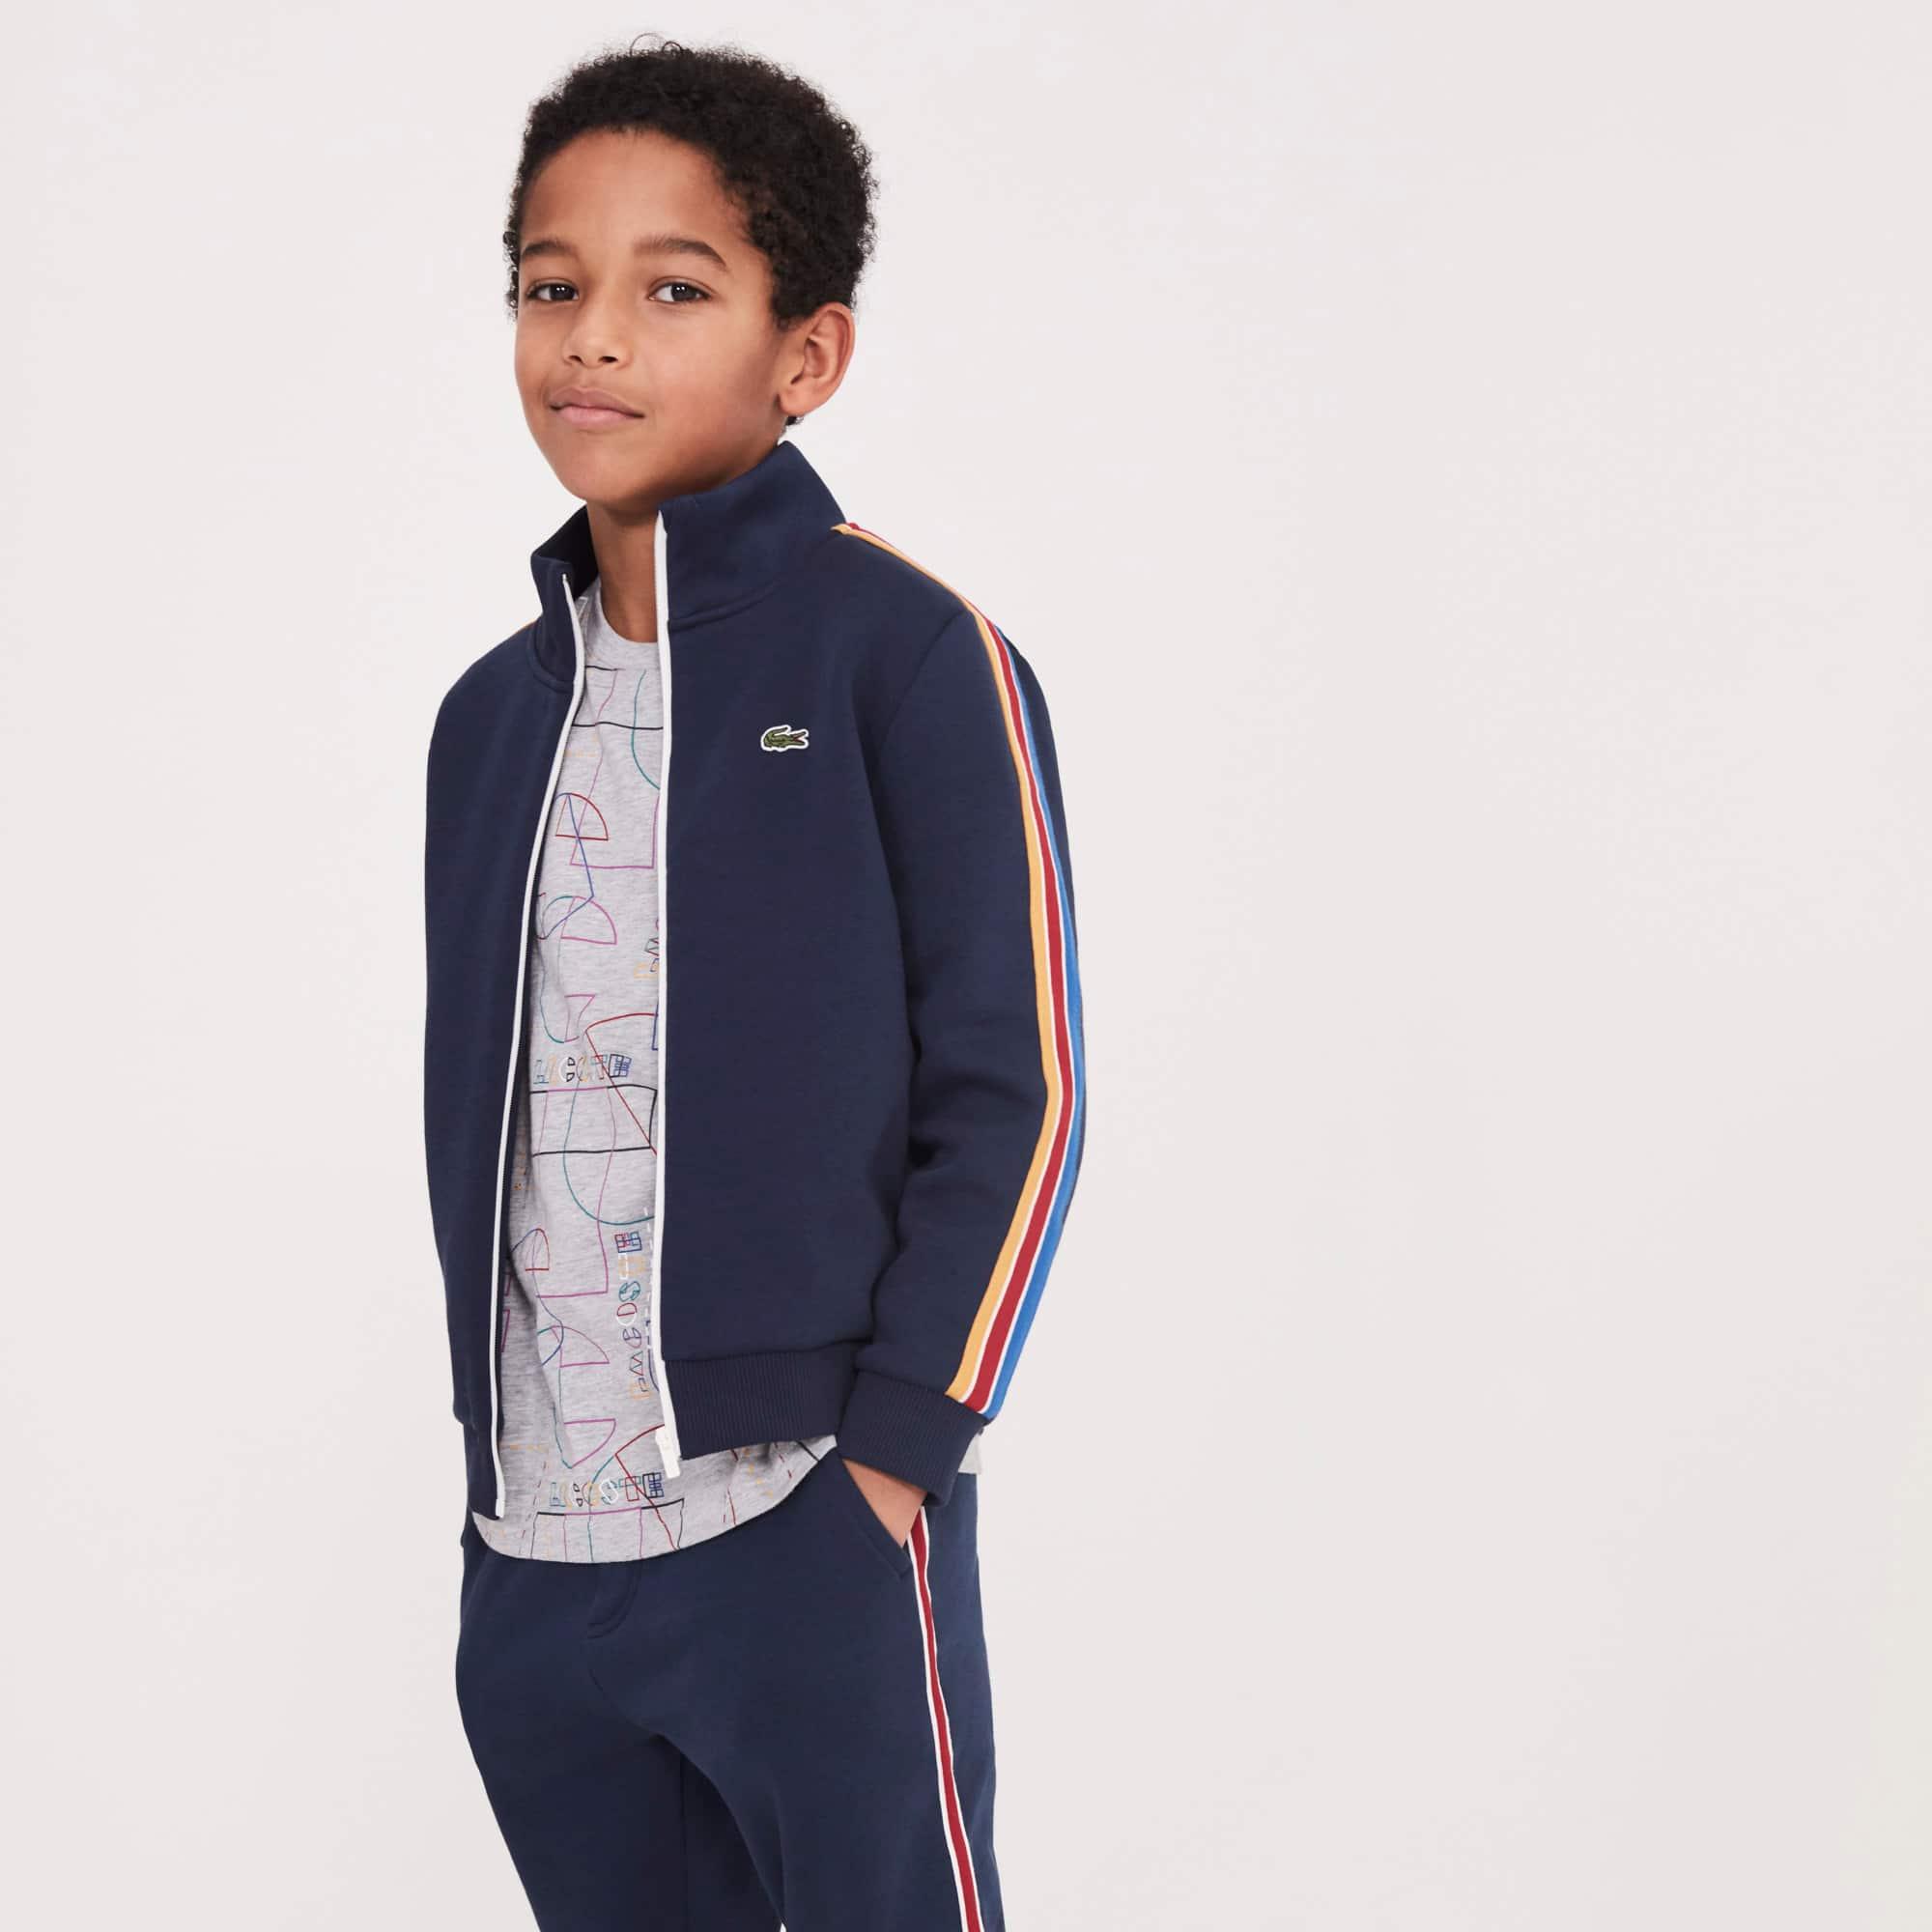 Boys' Stand-Up Collar Colored Bands Zippered Fleece Sweatshirt